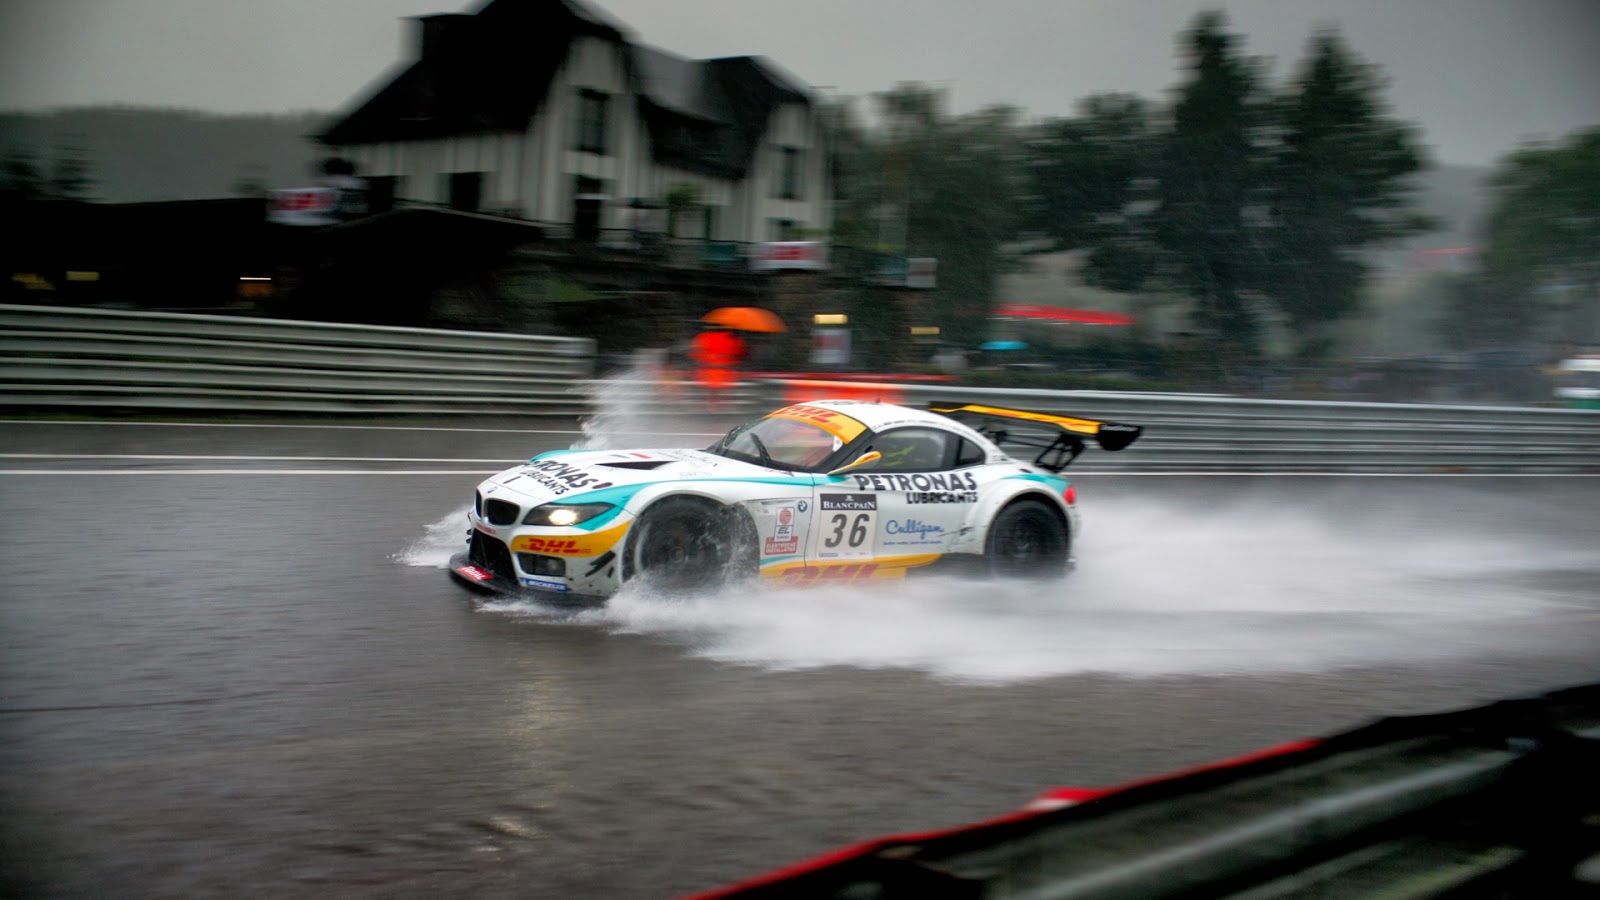 Cars Drifting bmw drift wallpaper hd 1600x900